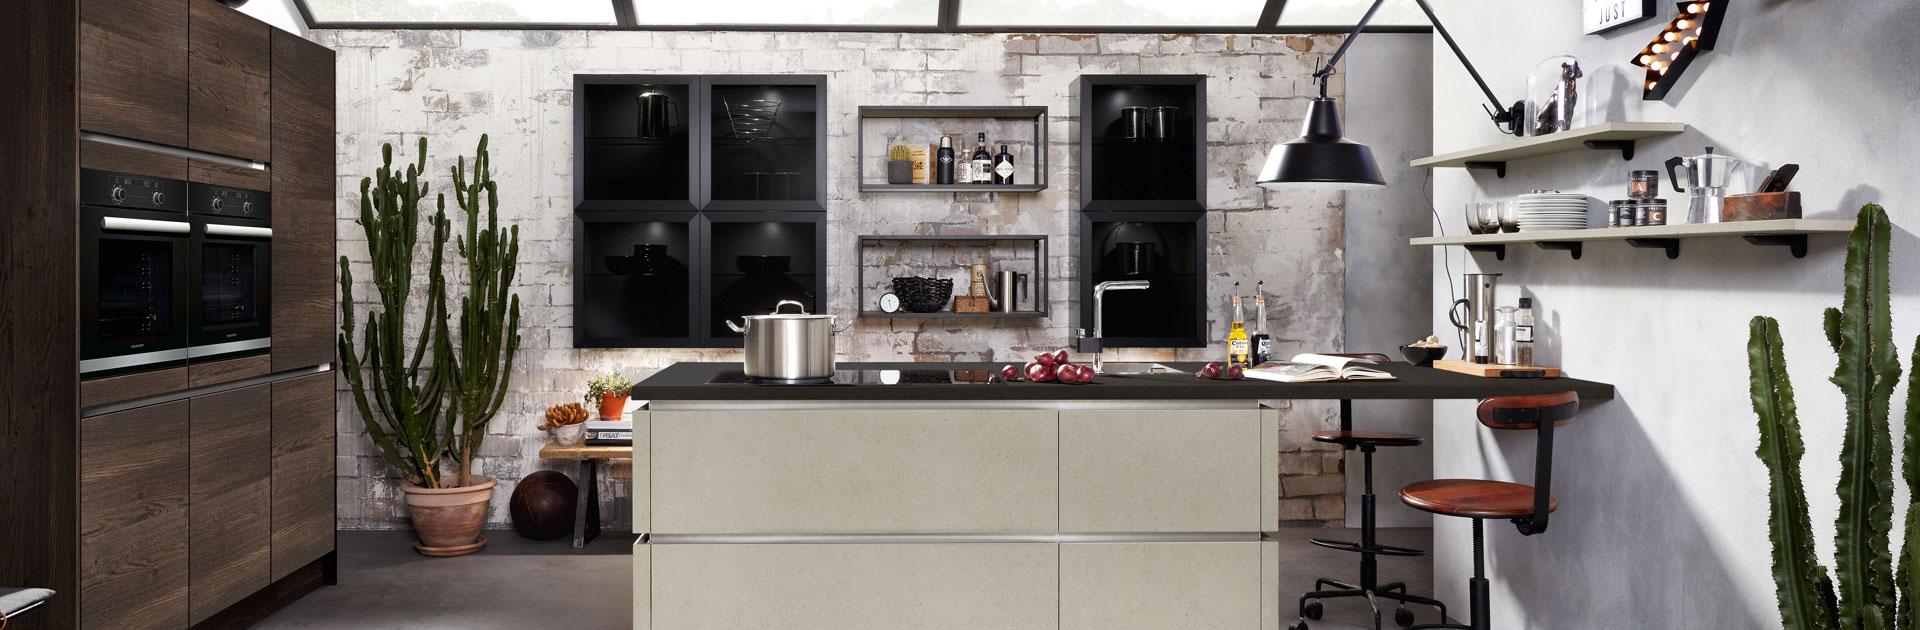 Robuuste keuken kopen | Eigenhuis Keukens